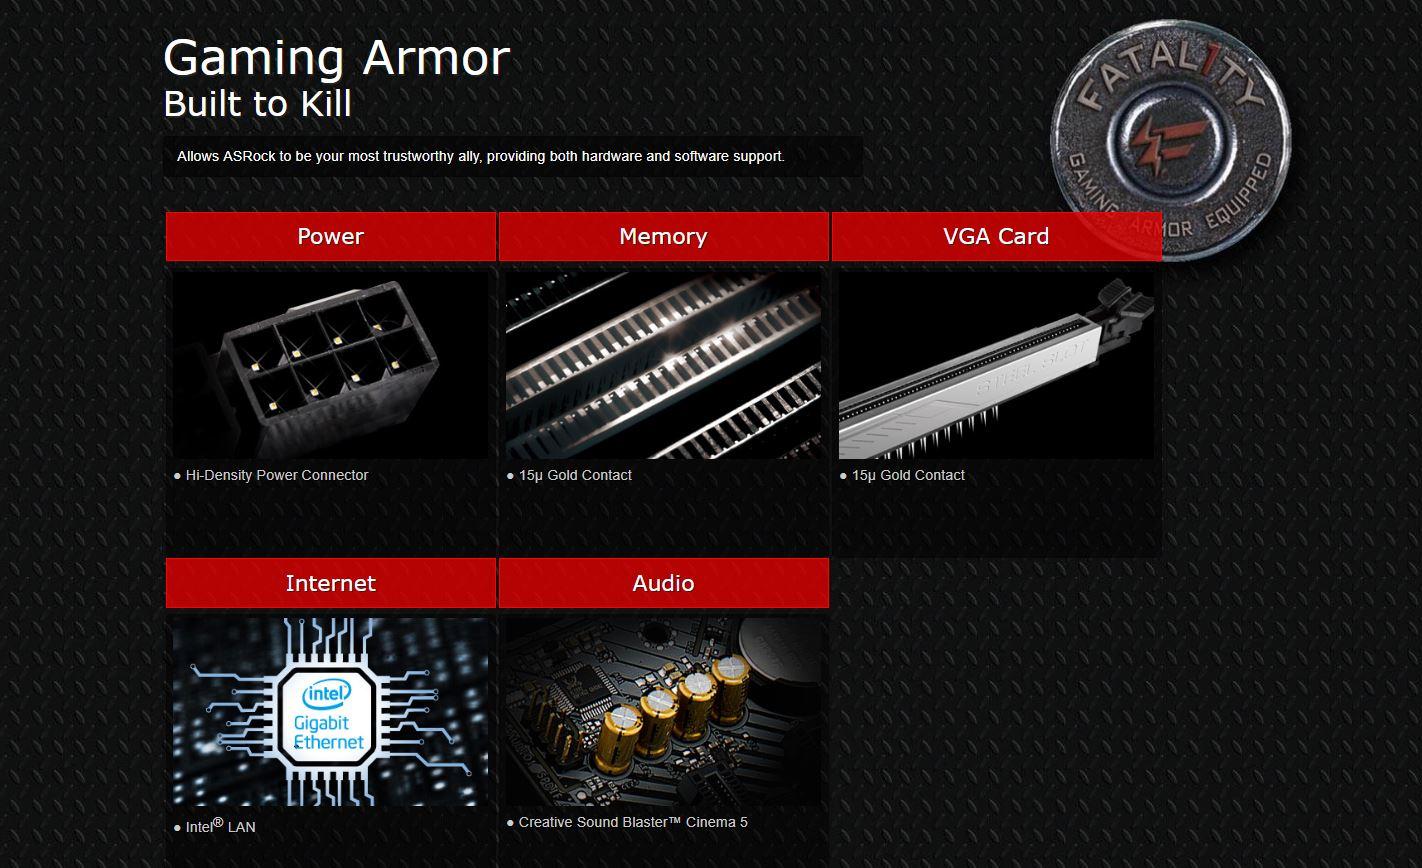 gamingarmor ASRock Fatal1ty B360M Performance ยกระดับคอมของคุณ สู่เกมมิ่งพีซีเต็มรูปแบบ